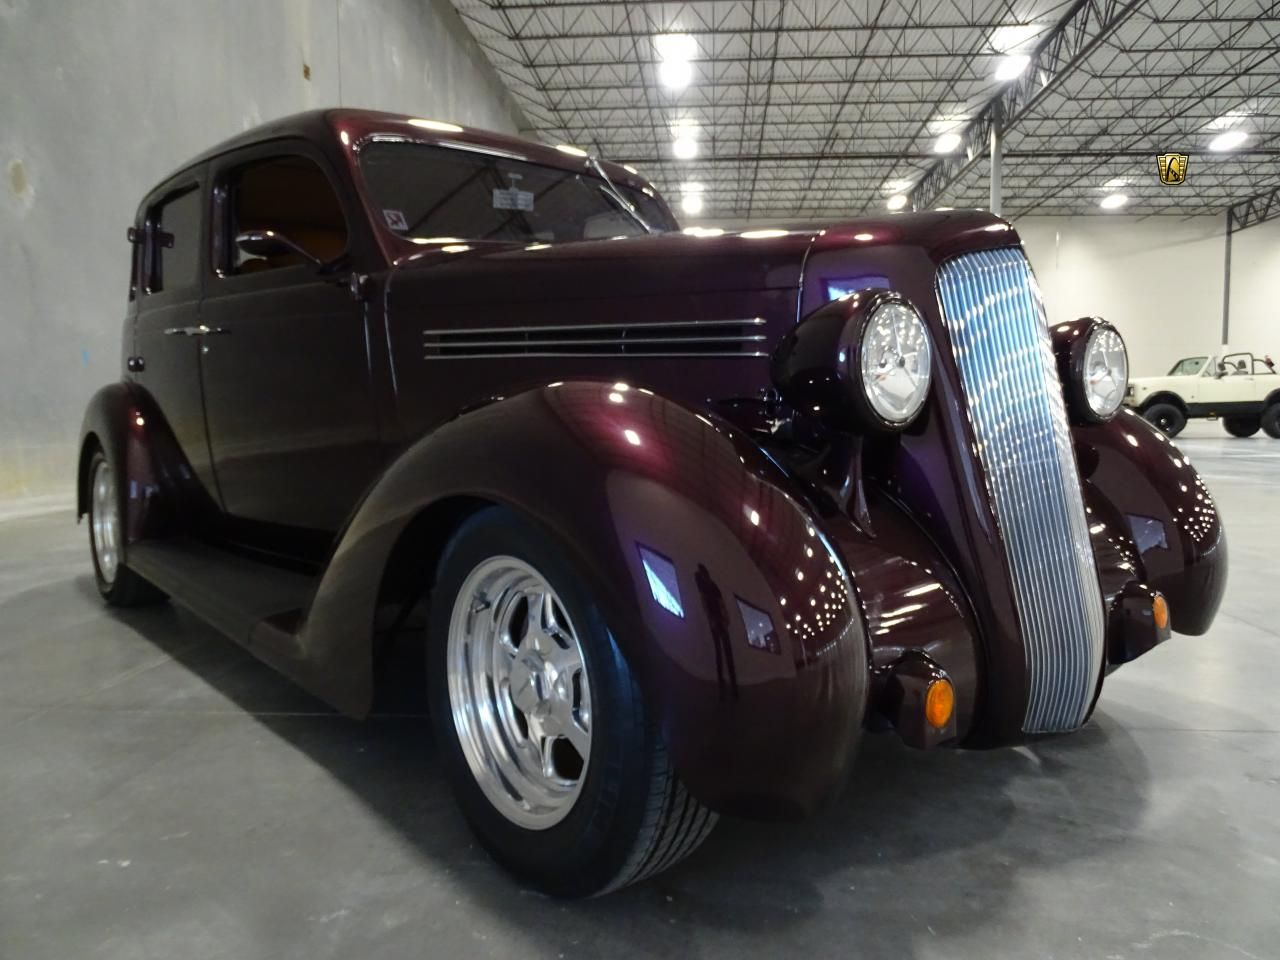 For sale in our Dallas, Texas showroom is a Purple 4 Door Sedan ...